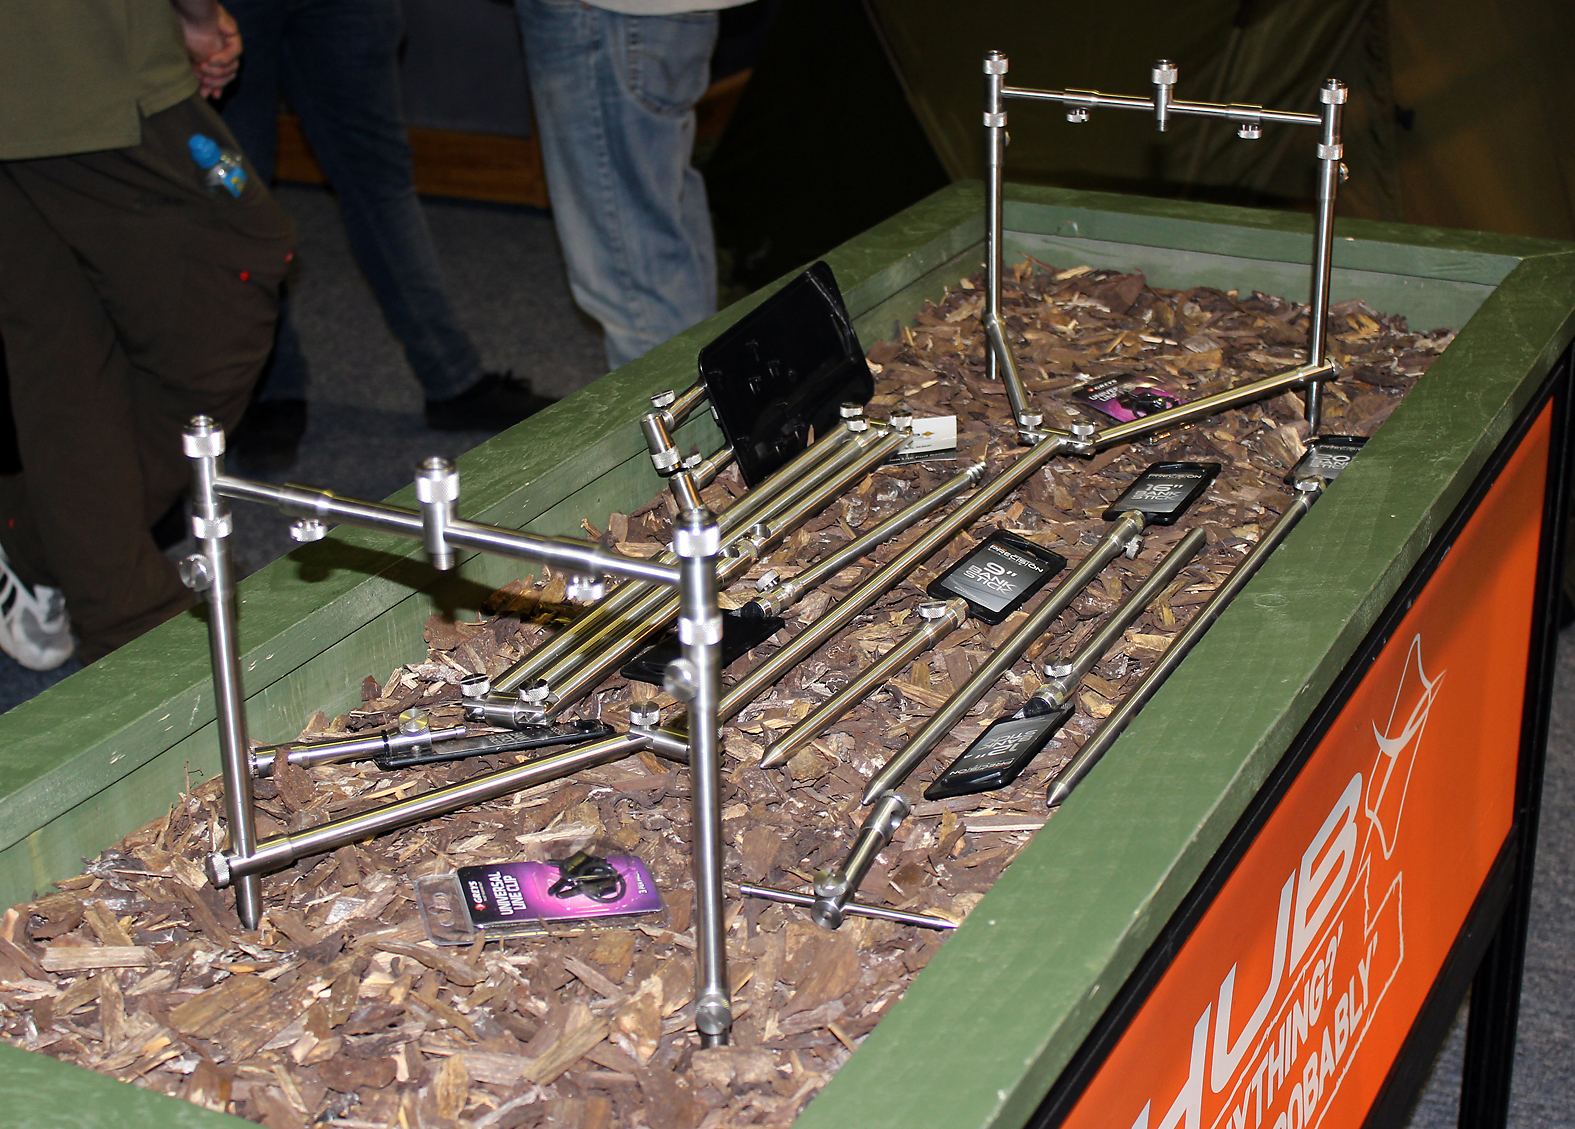 Chub's Precision Lite Pod Base was tough and folds away neatly